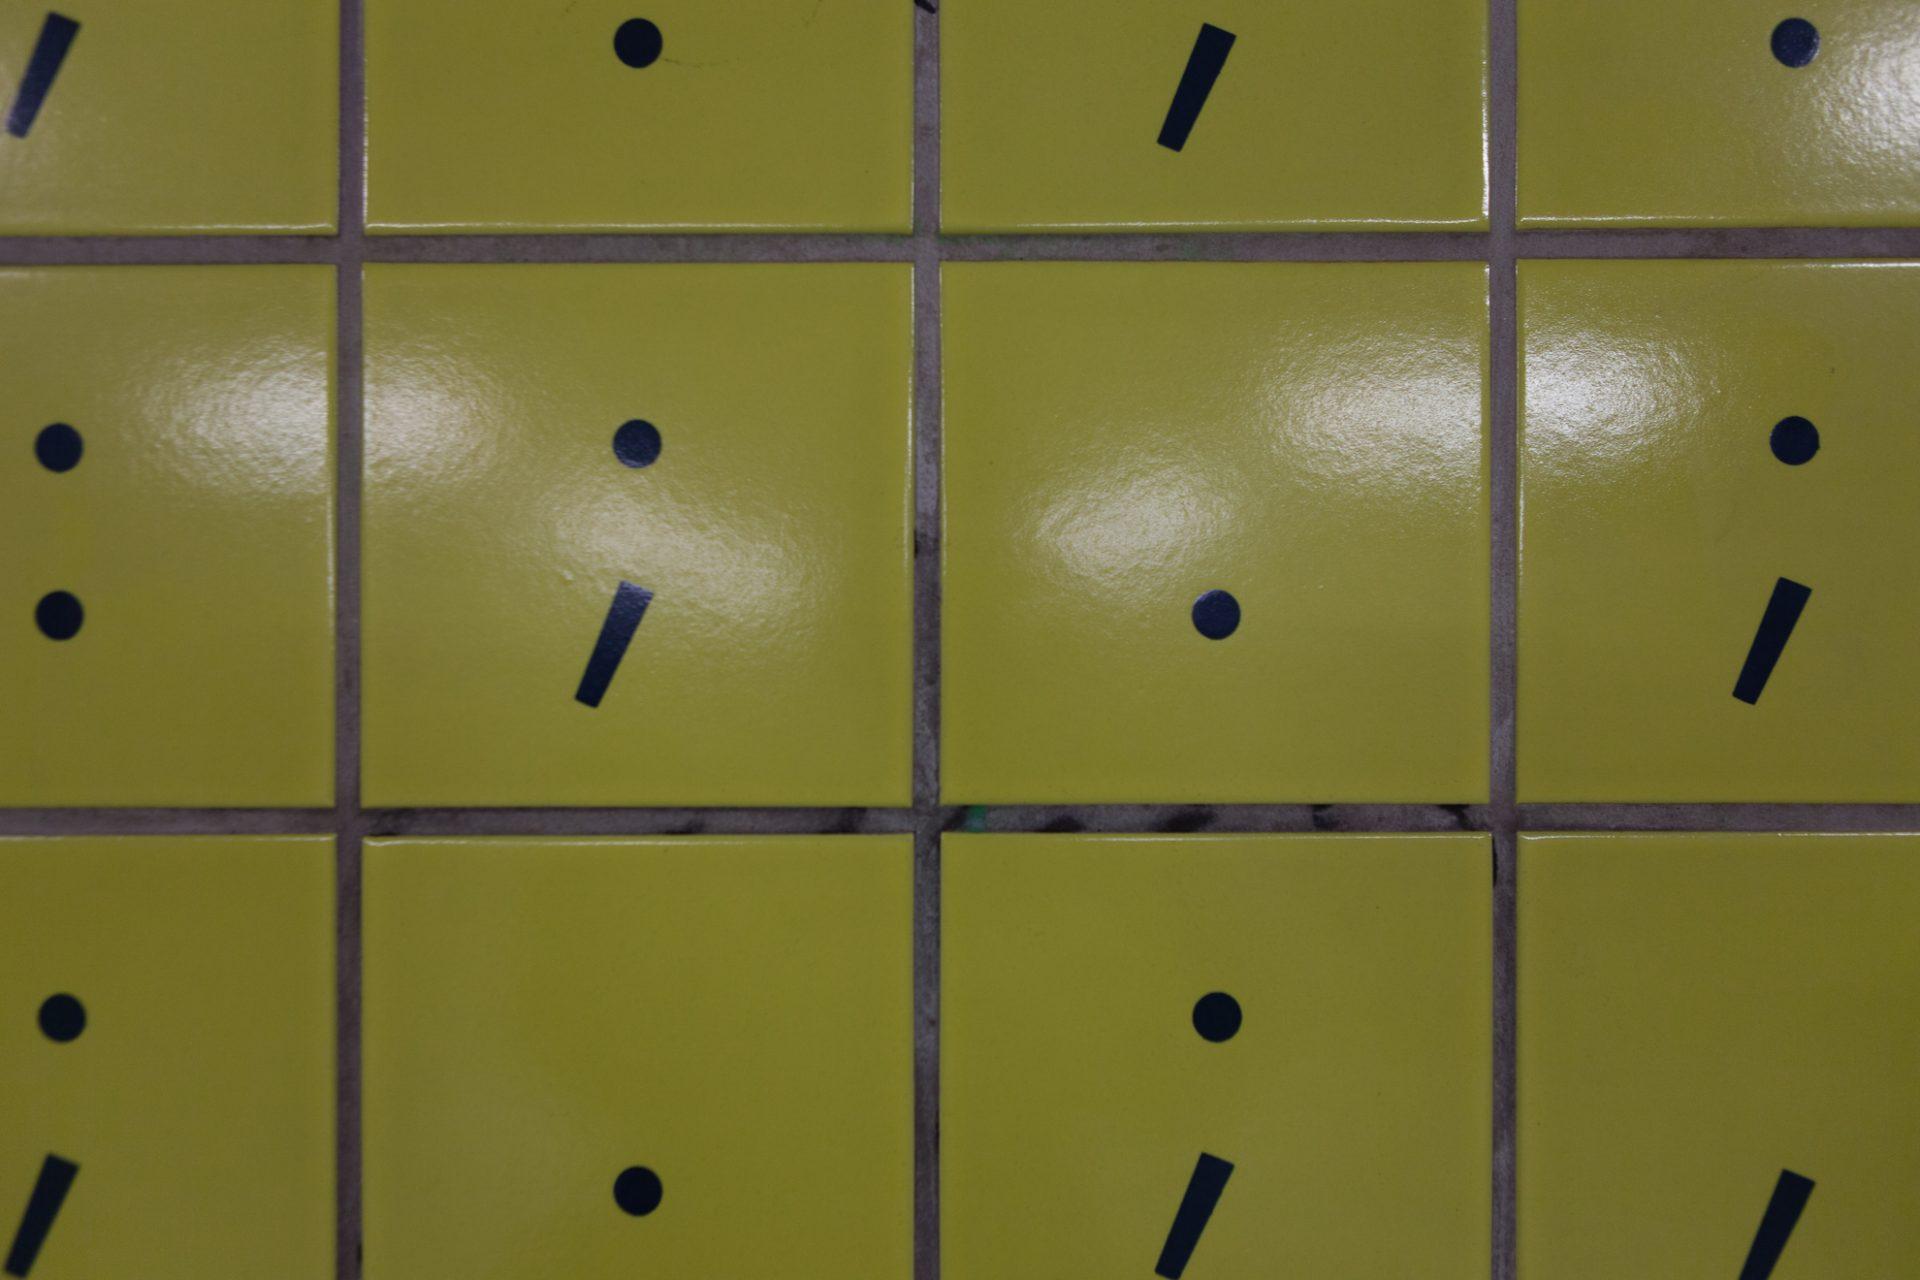 U9 – Tiles